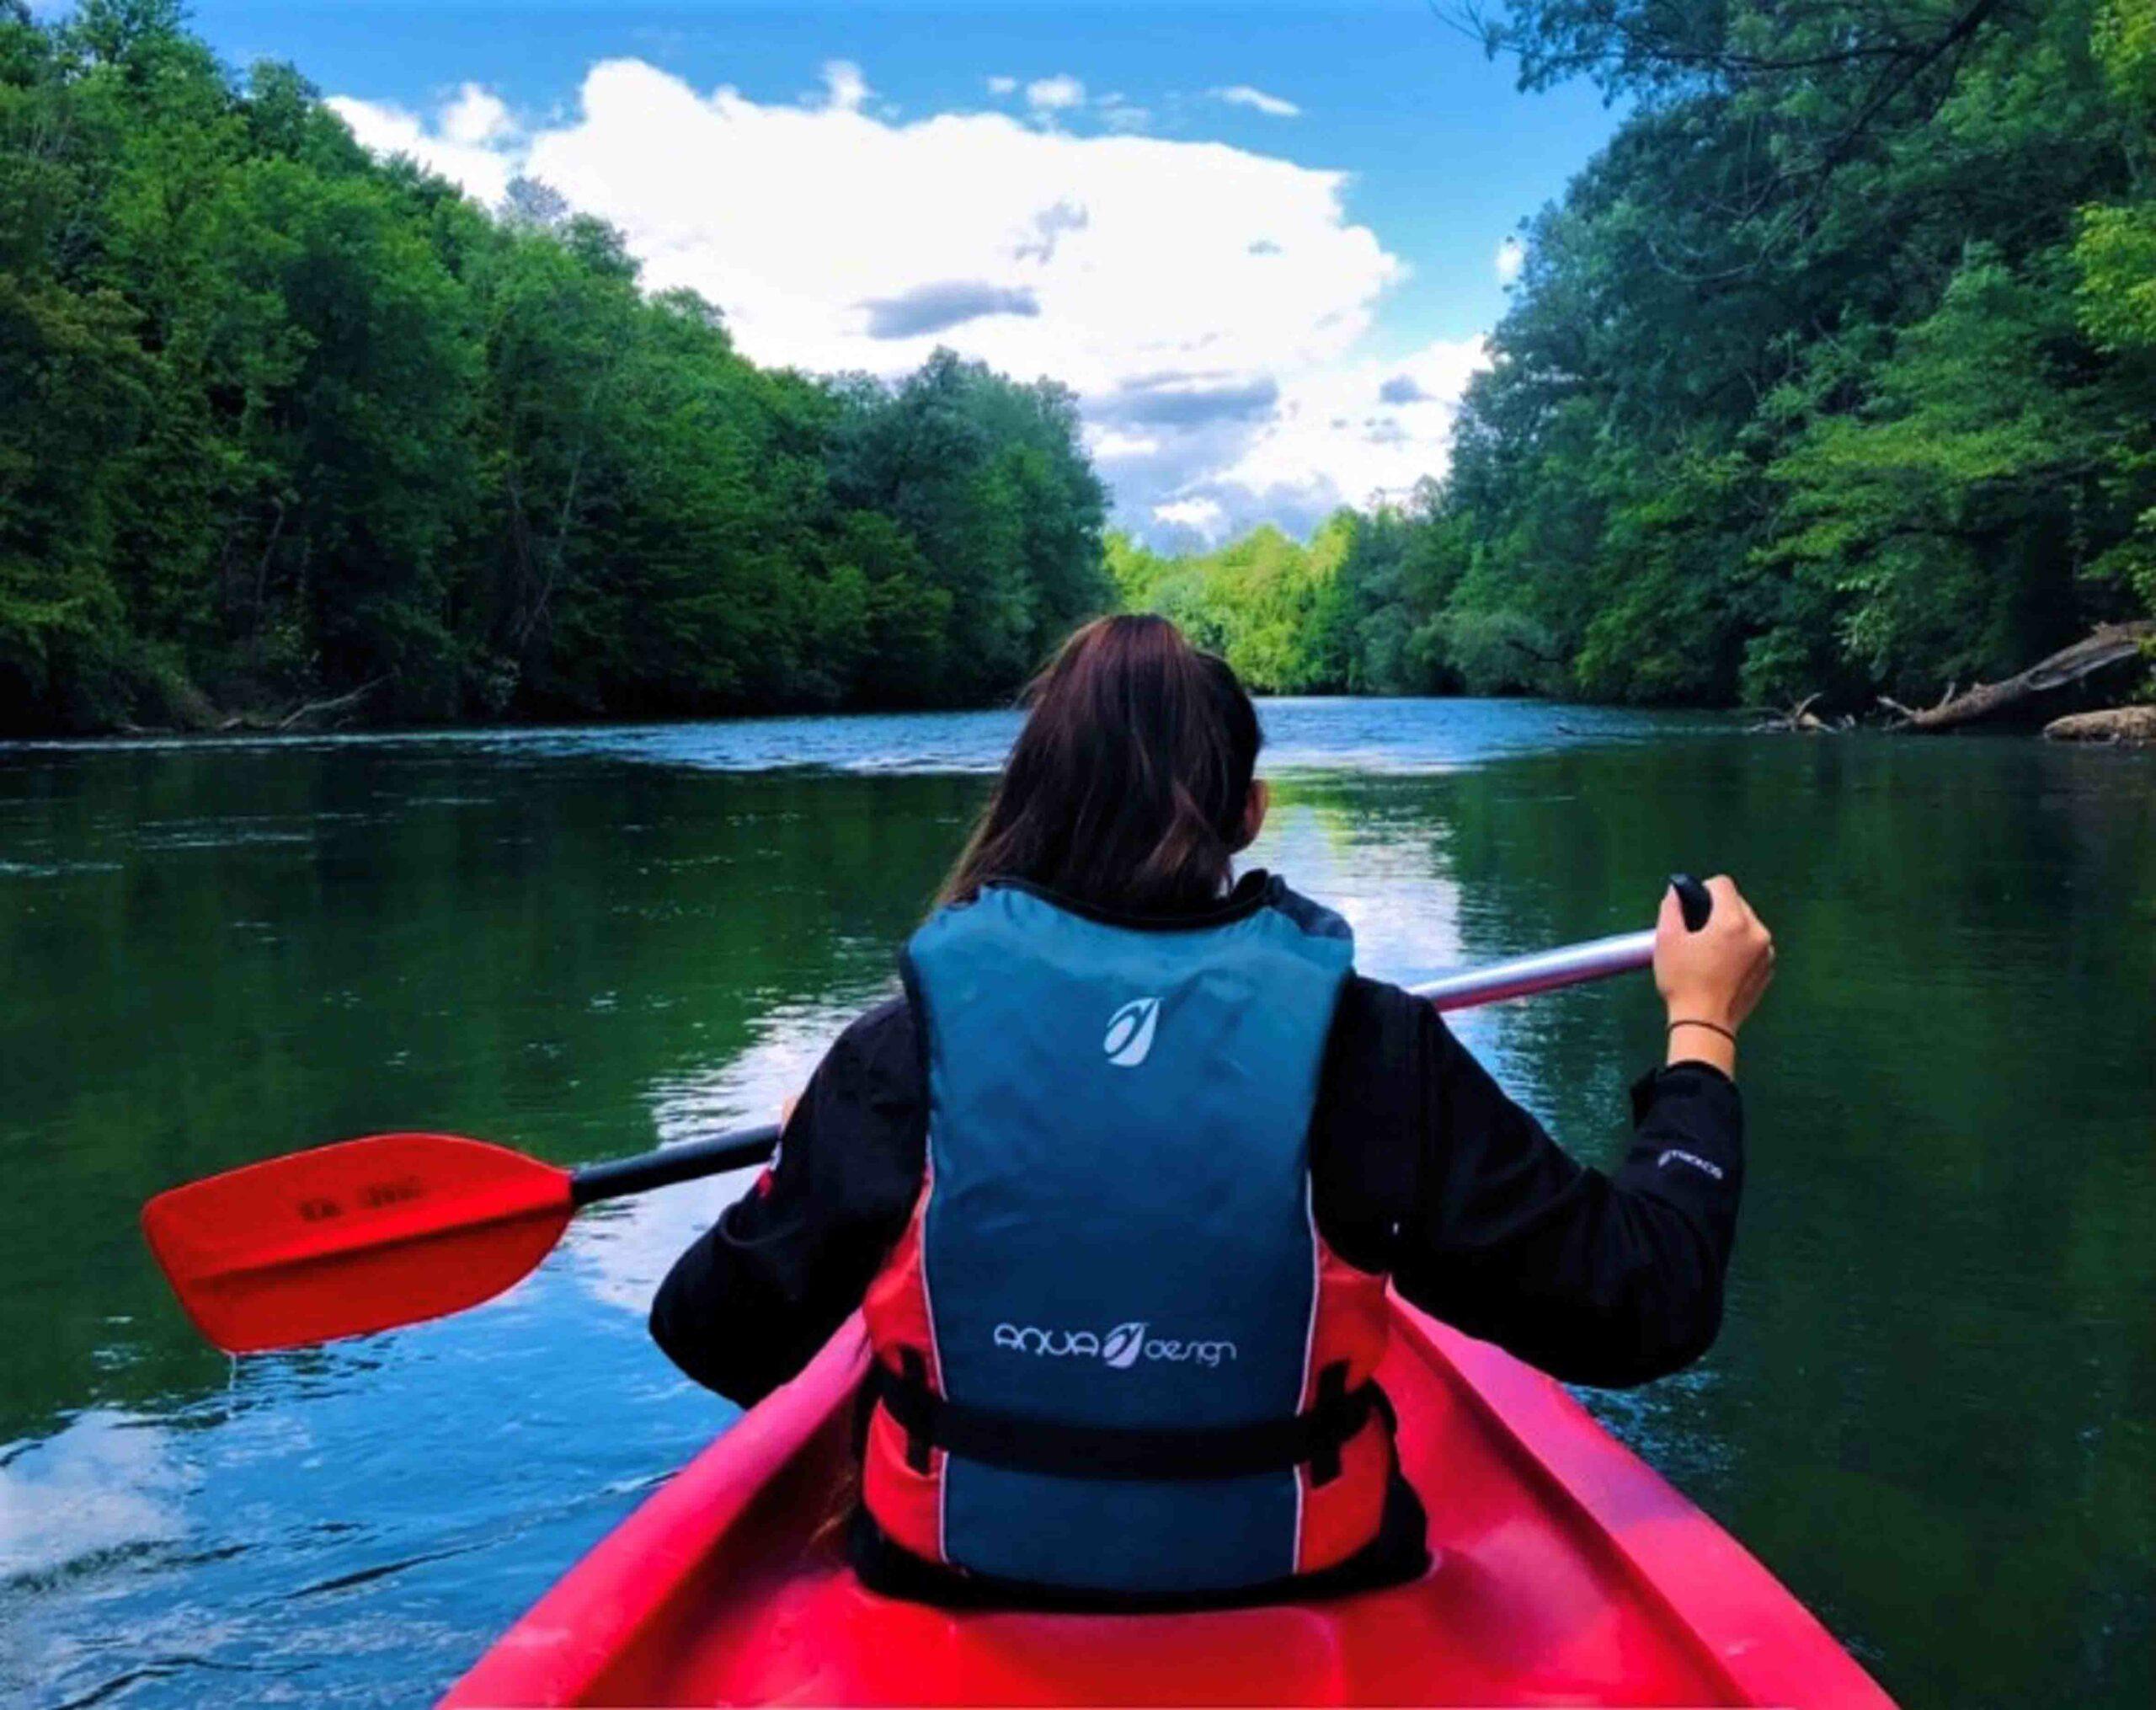 escursione in canoa sul fiume Kolpa in Bela Krajina, Slovenia